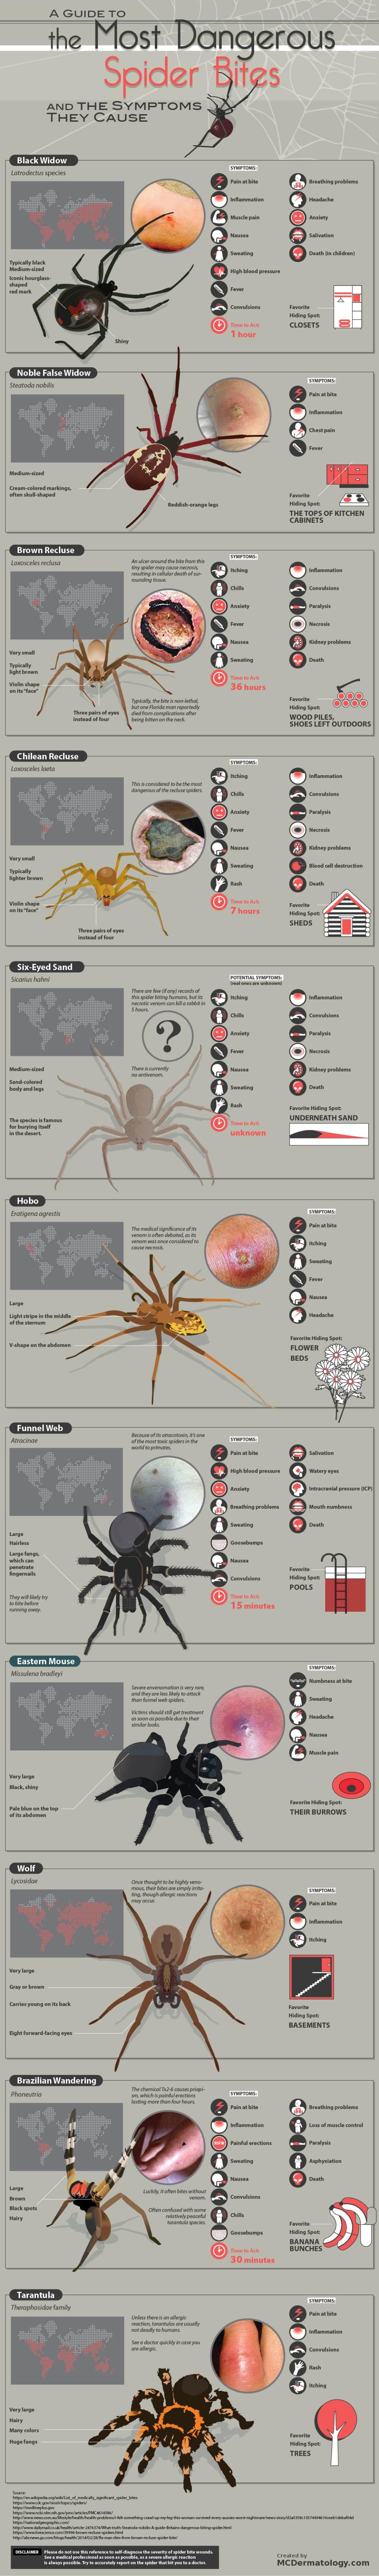 How to Recognize Dangerous Spider Bites - Infographic